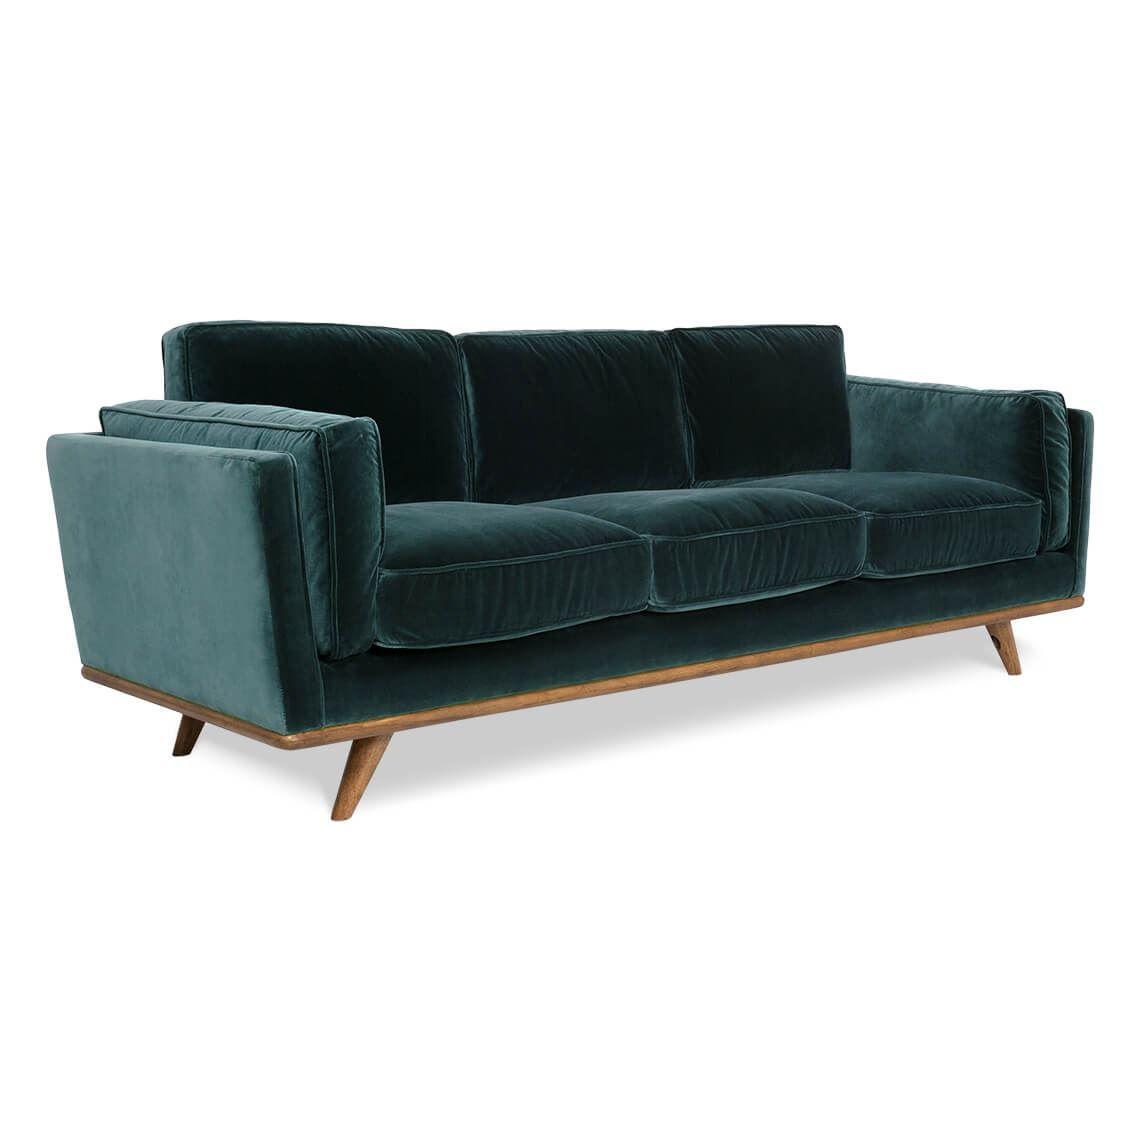 Surprising Dahlia 3 Seat Velvet Sofa In 2019 Velvet Sofa Sofa Theyellowbook Wood Chair Design Ideas Theyellowbookinfo